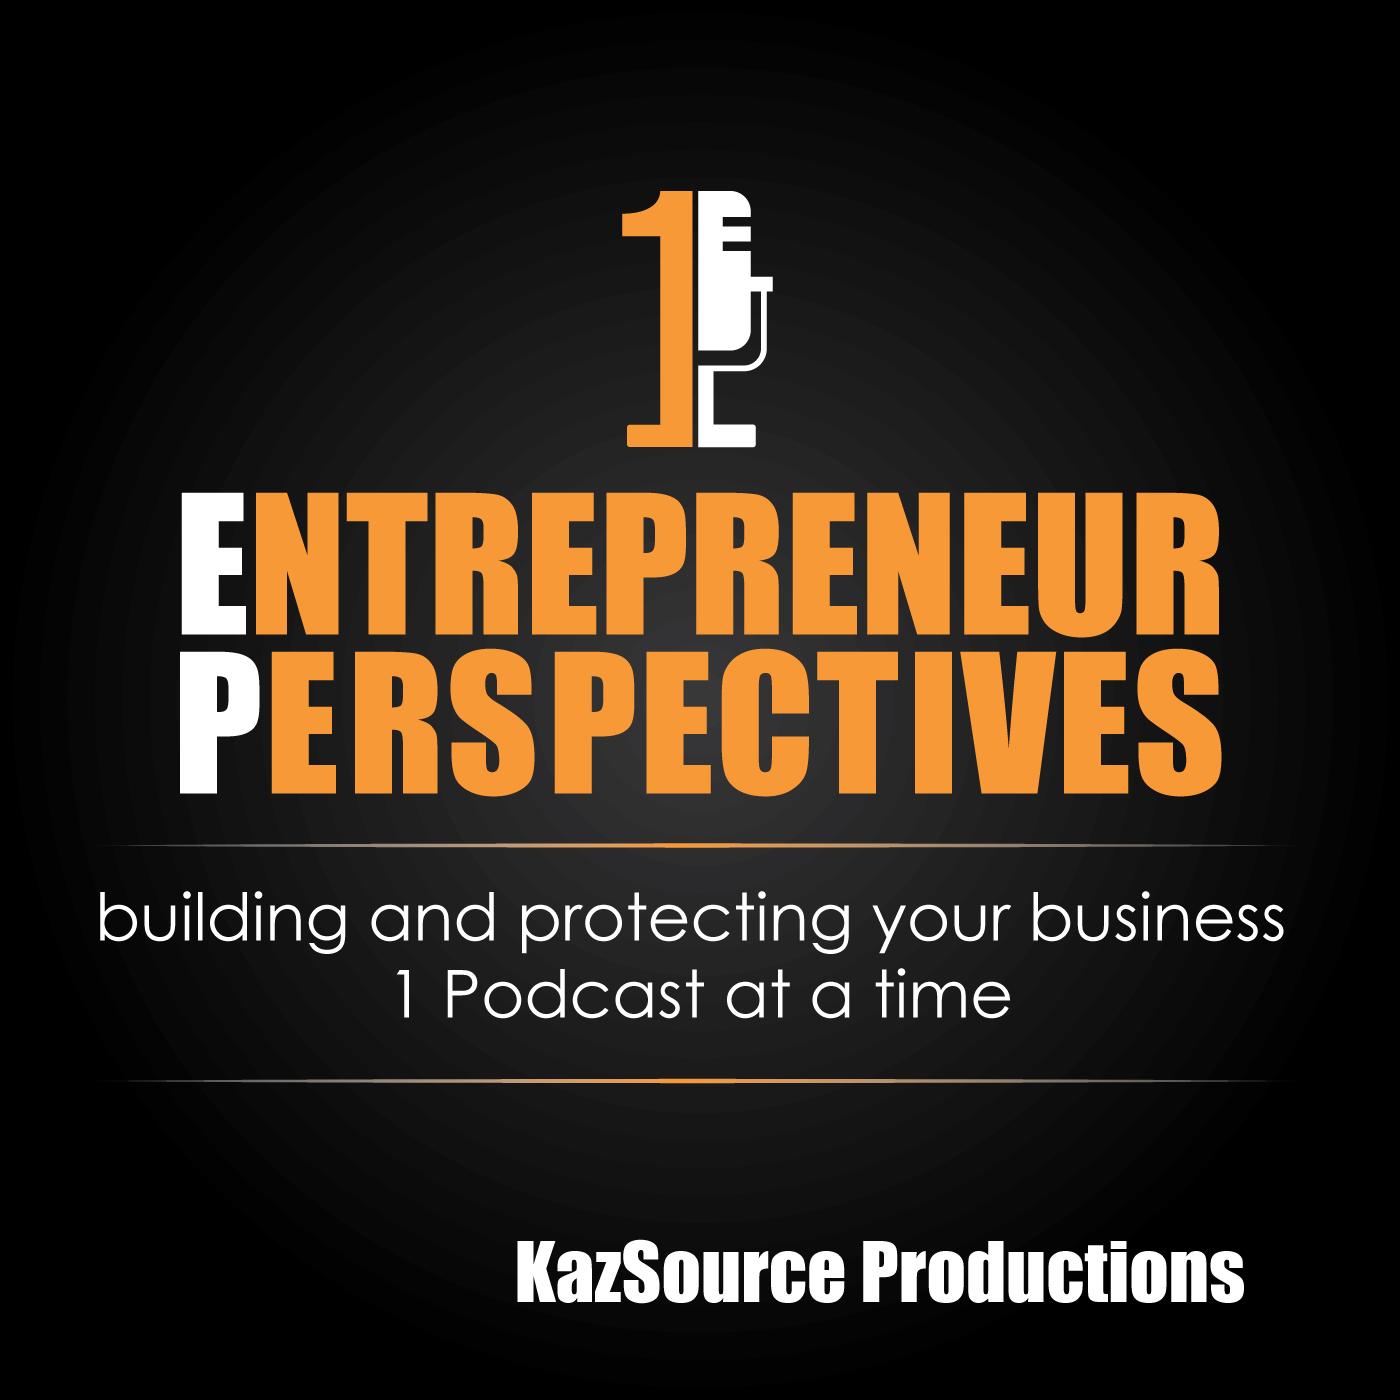 Entrepreneur Perspectives